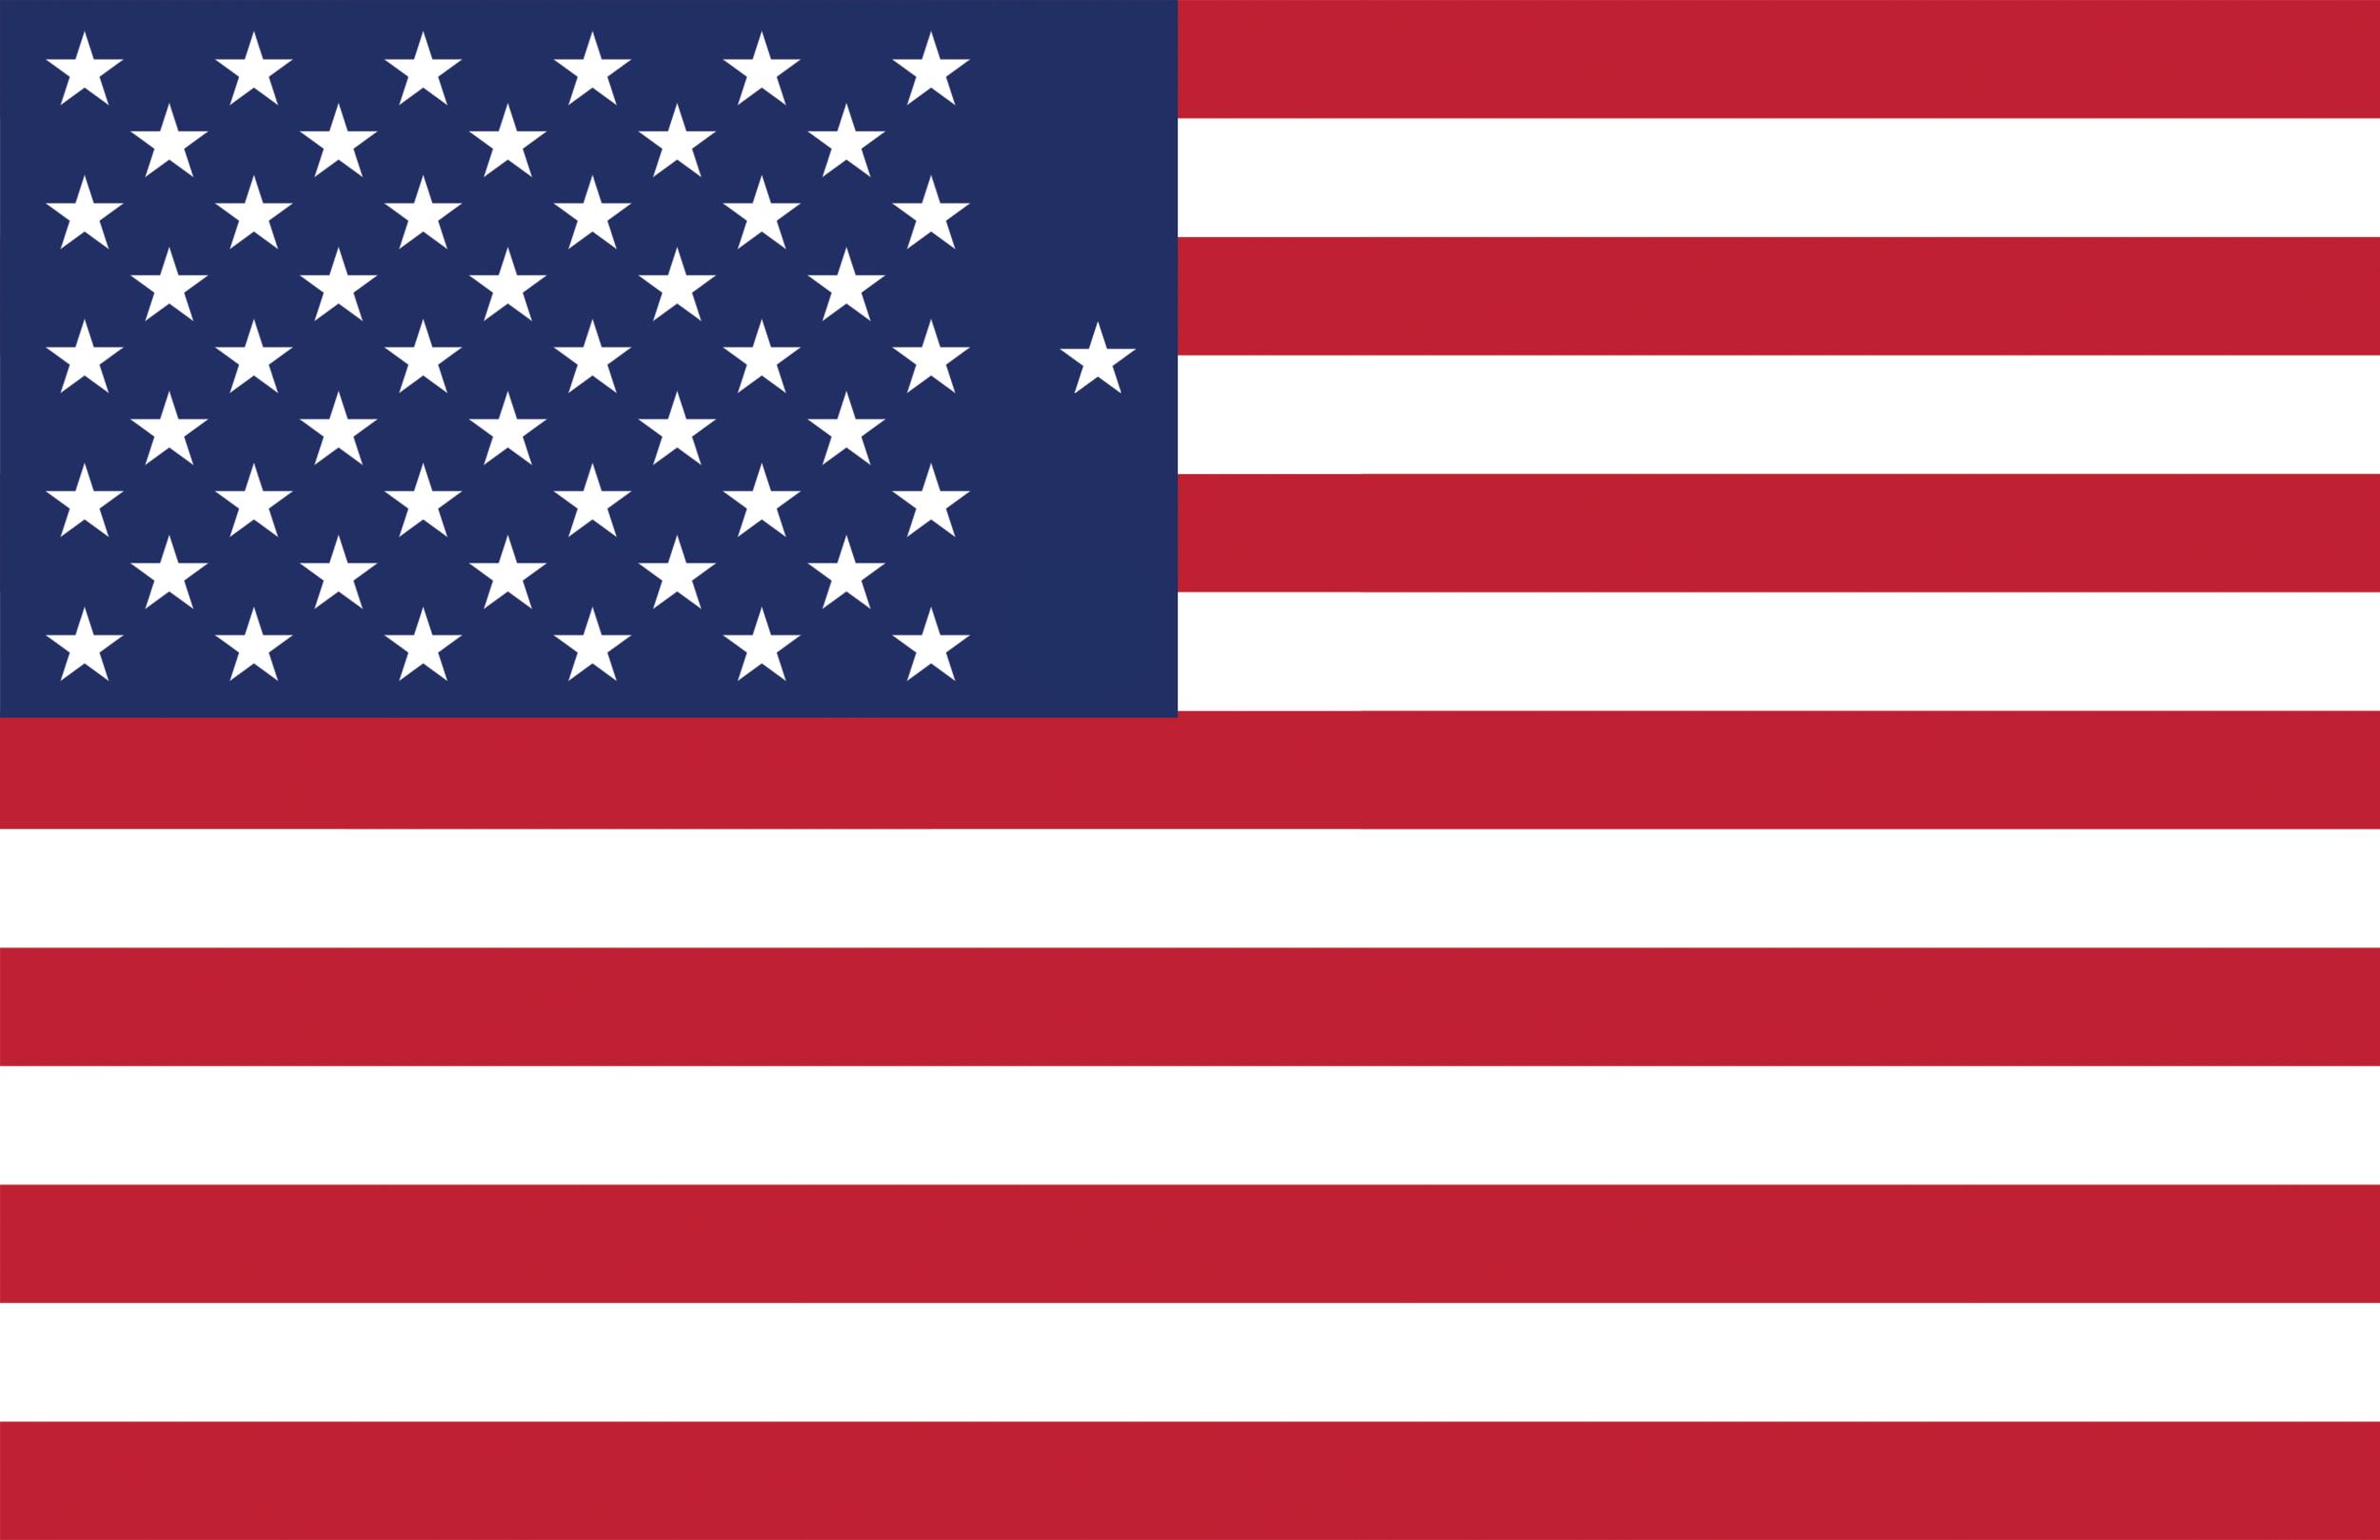 Washington D.C Statehood Metaphorical Image